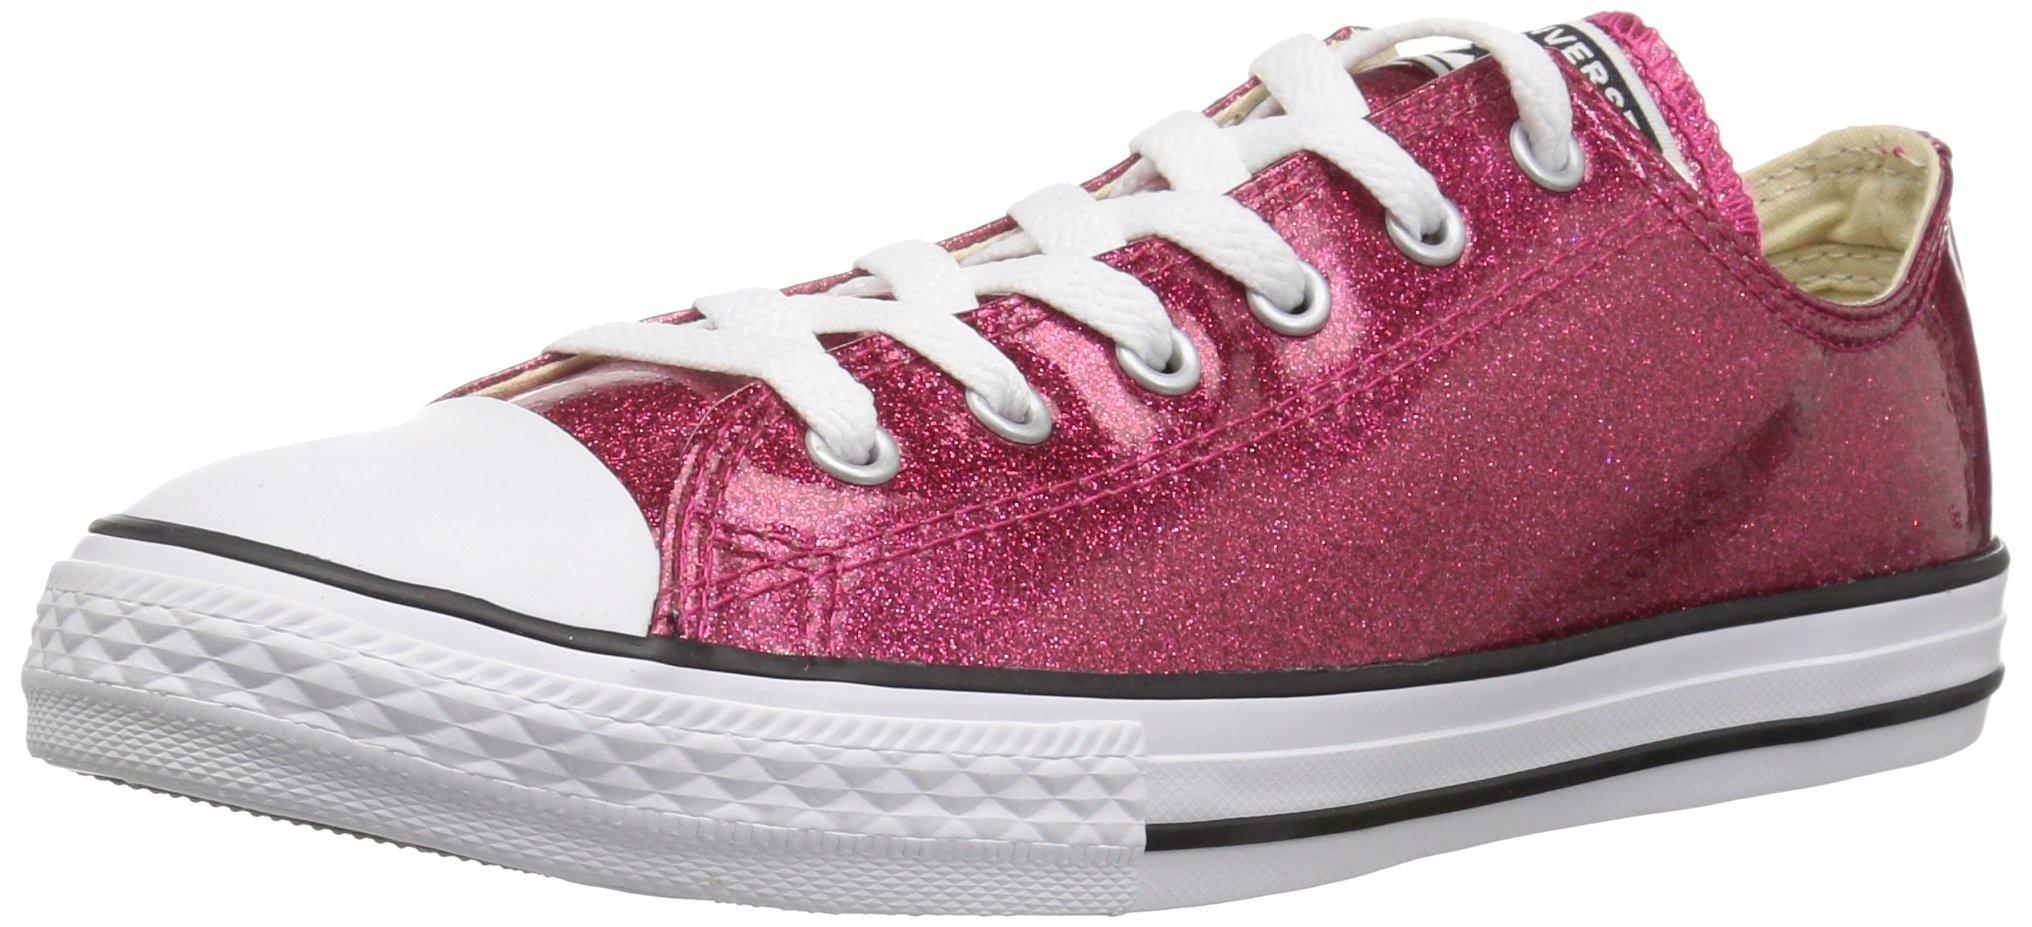 380b29feb657 Converse Girls' Chuck Taylor All Star Glitter Low Top Sneaker, Fuchsia, 3 M